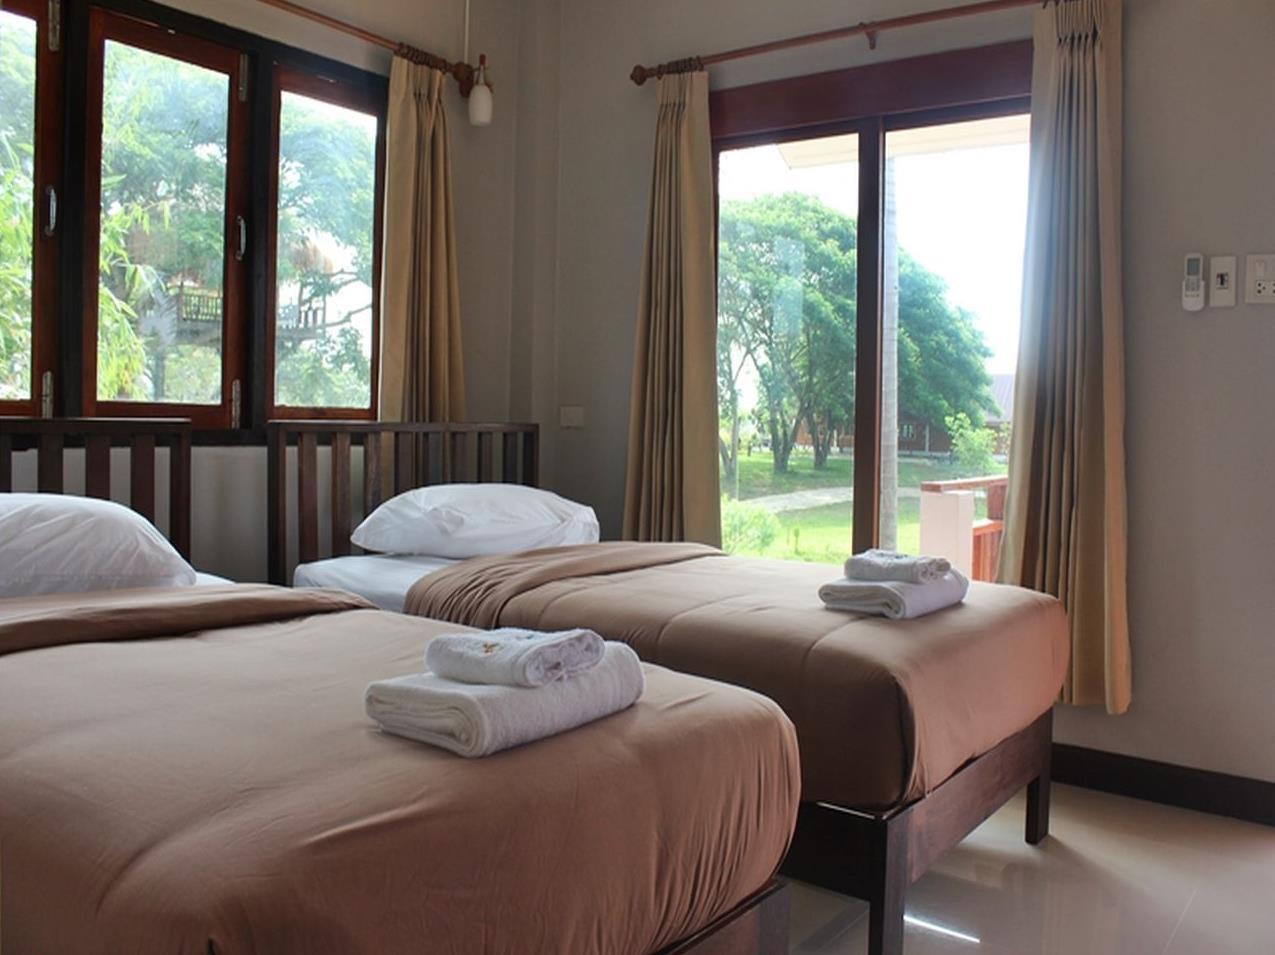 Rai Lam Poo Farm and Camping Resort, Muang Nakhon Sawan